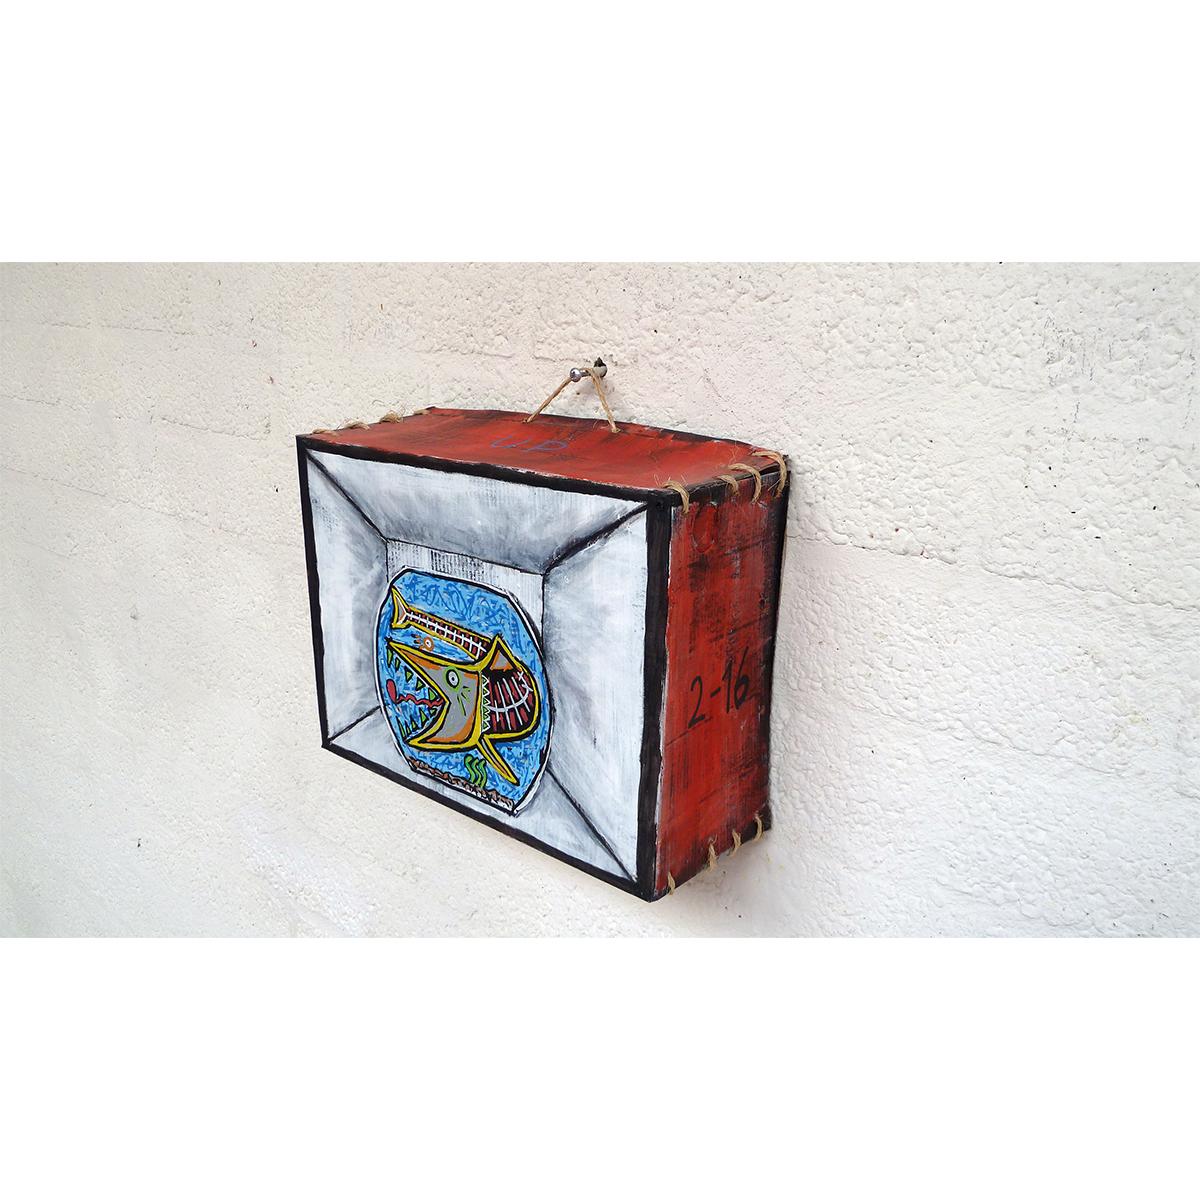 BOX (01) 'FISHBOWL' 03 - Frank Willems